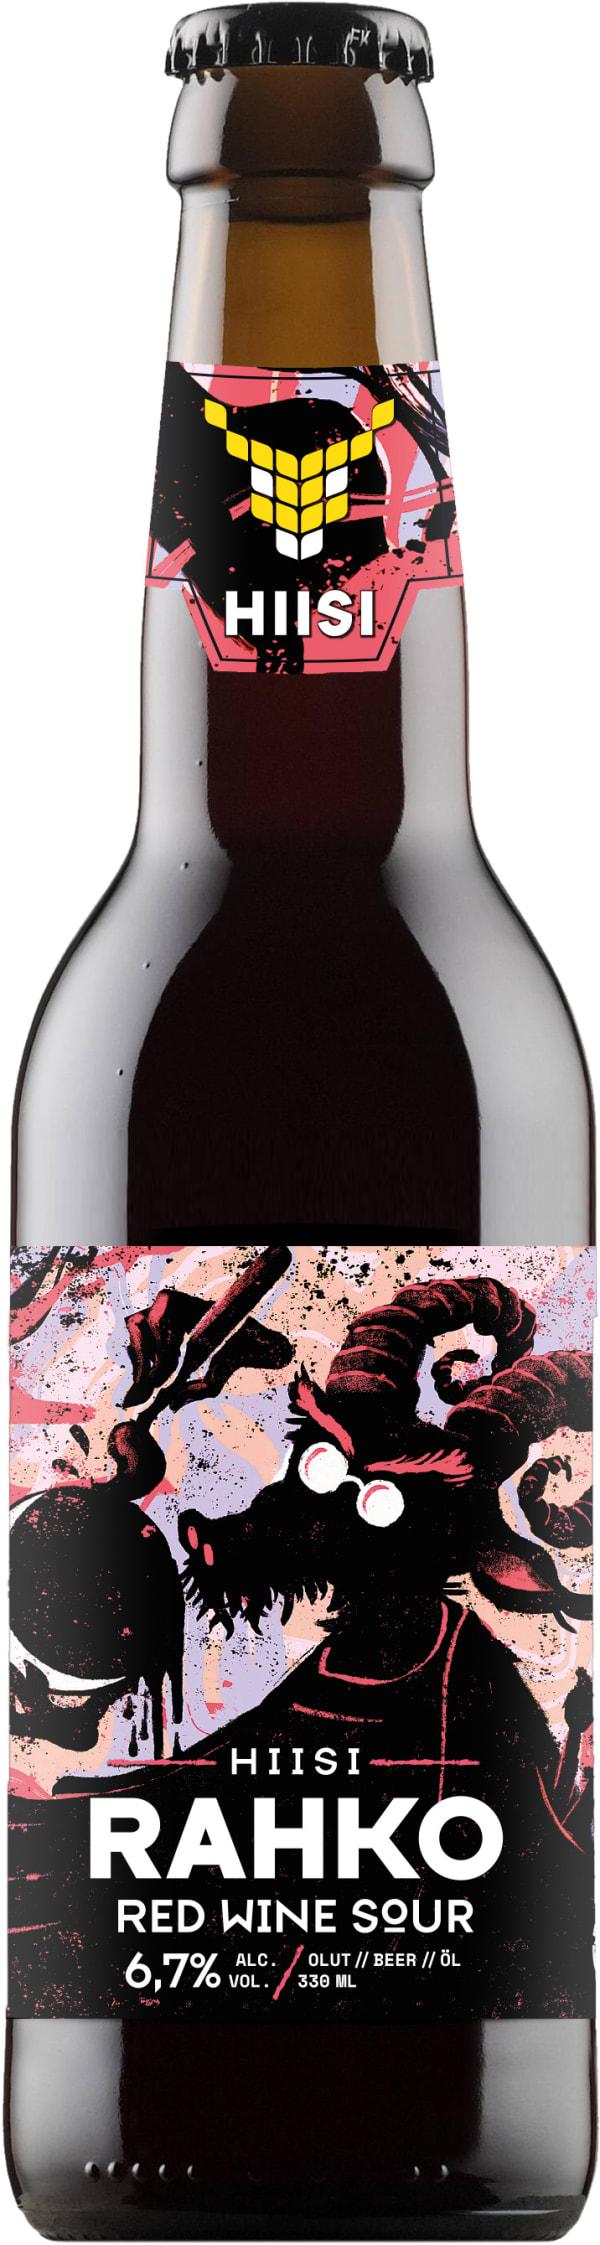 Hiisi Rahko Red Wine Sour